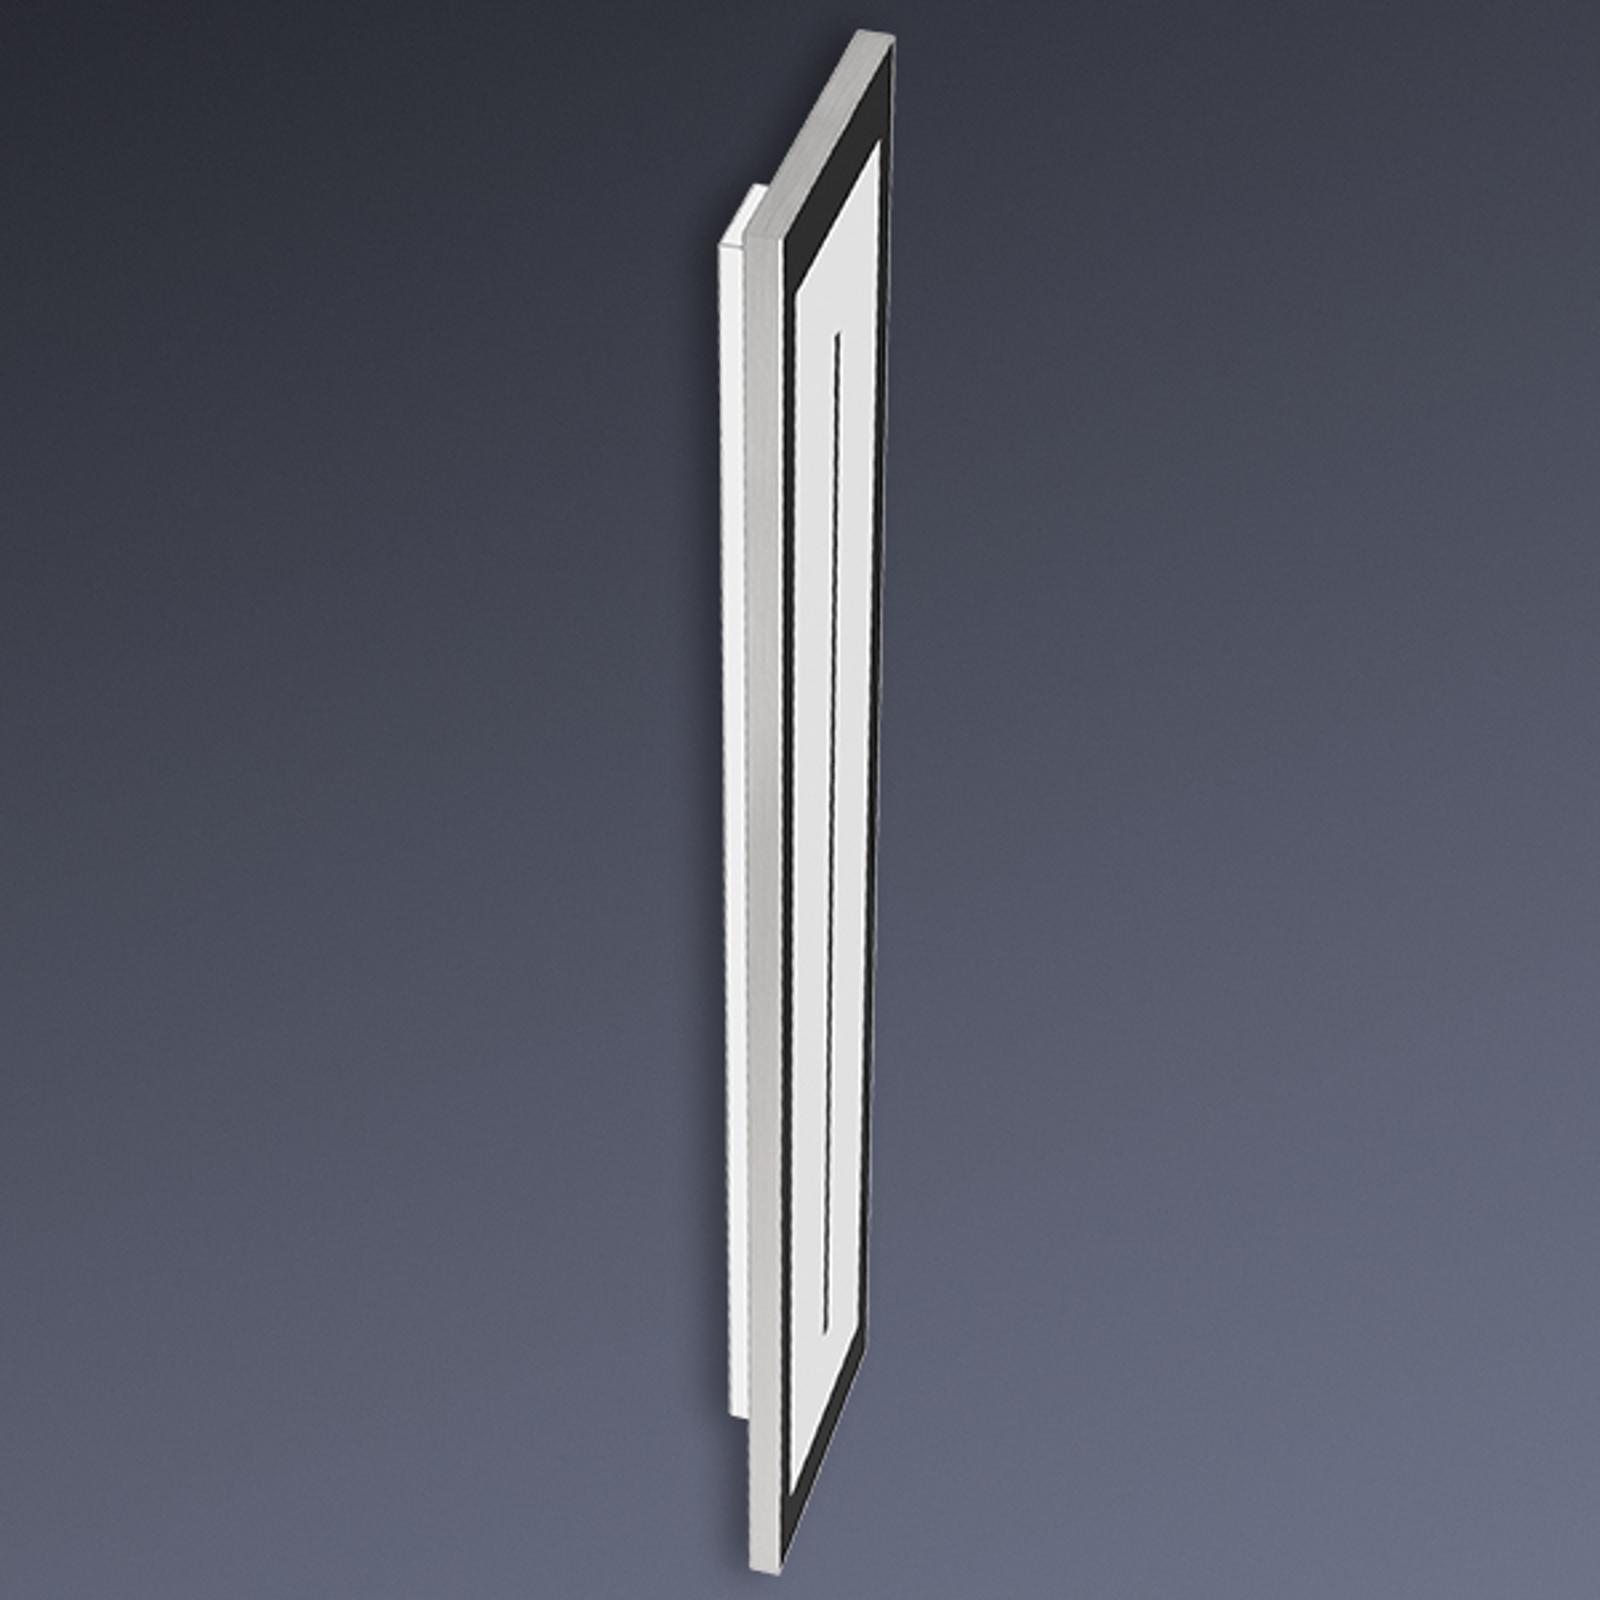 Höhe 90 cm - LED-Wandleuchte Zen